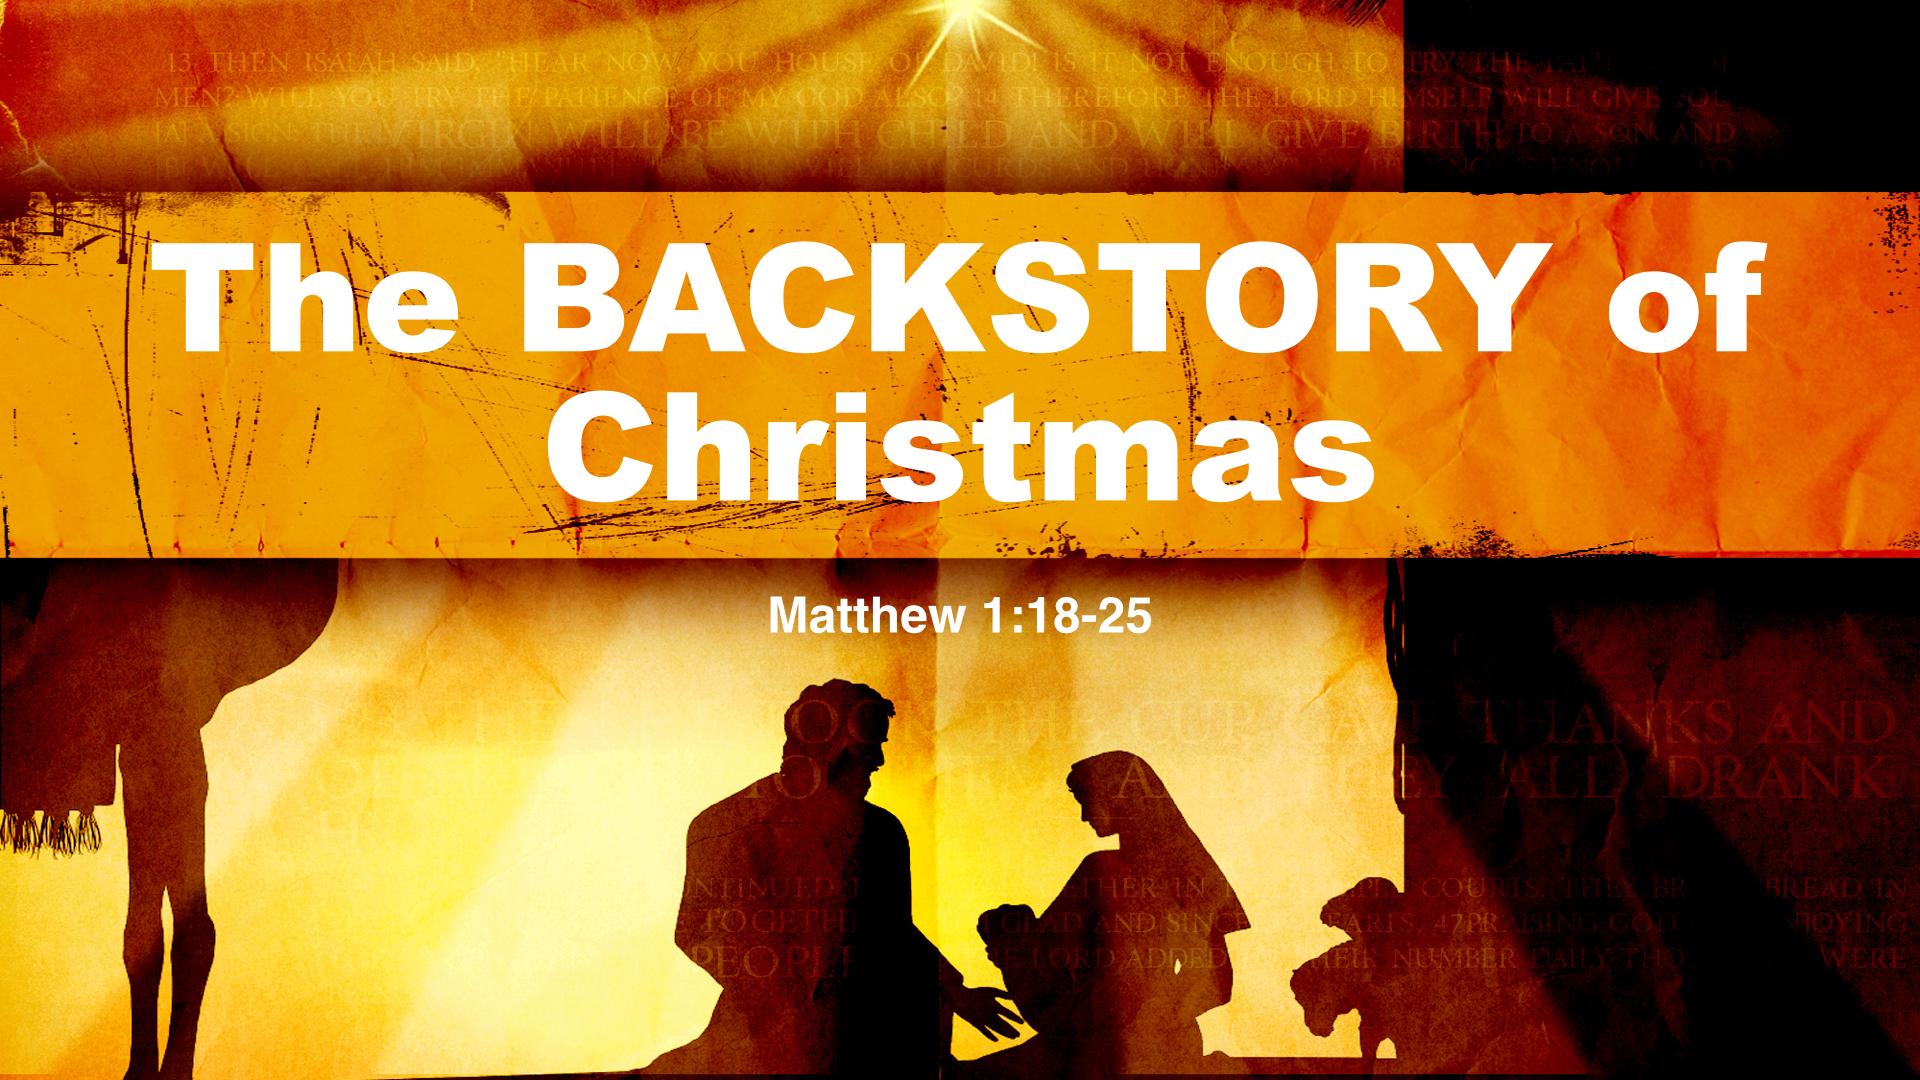 The Backstory of Christmas web.jpg.001